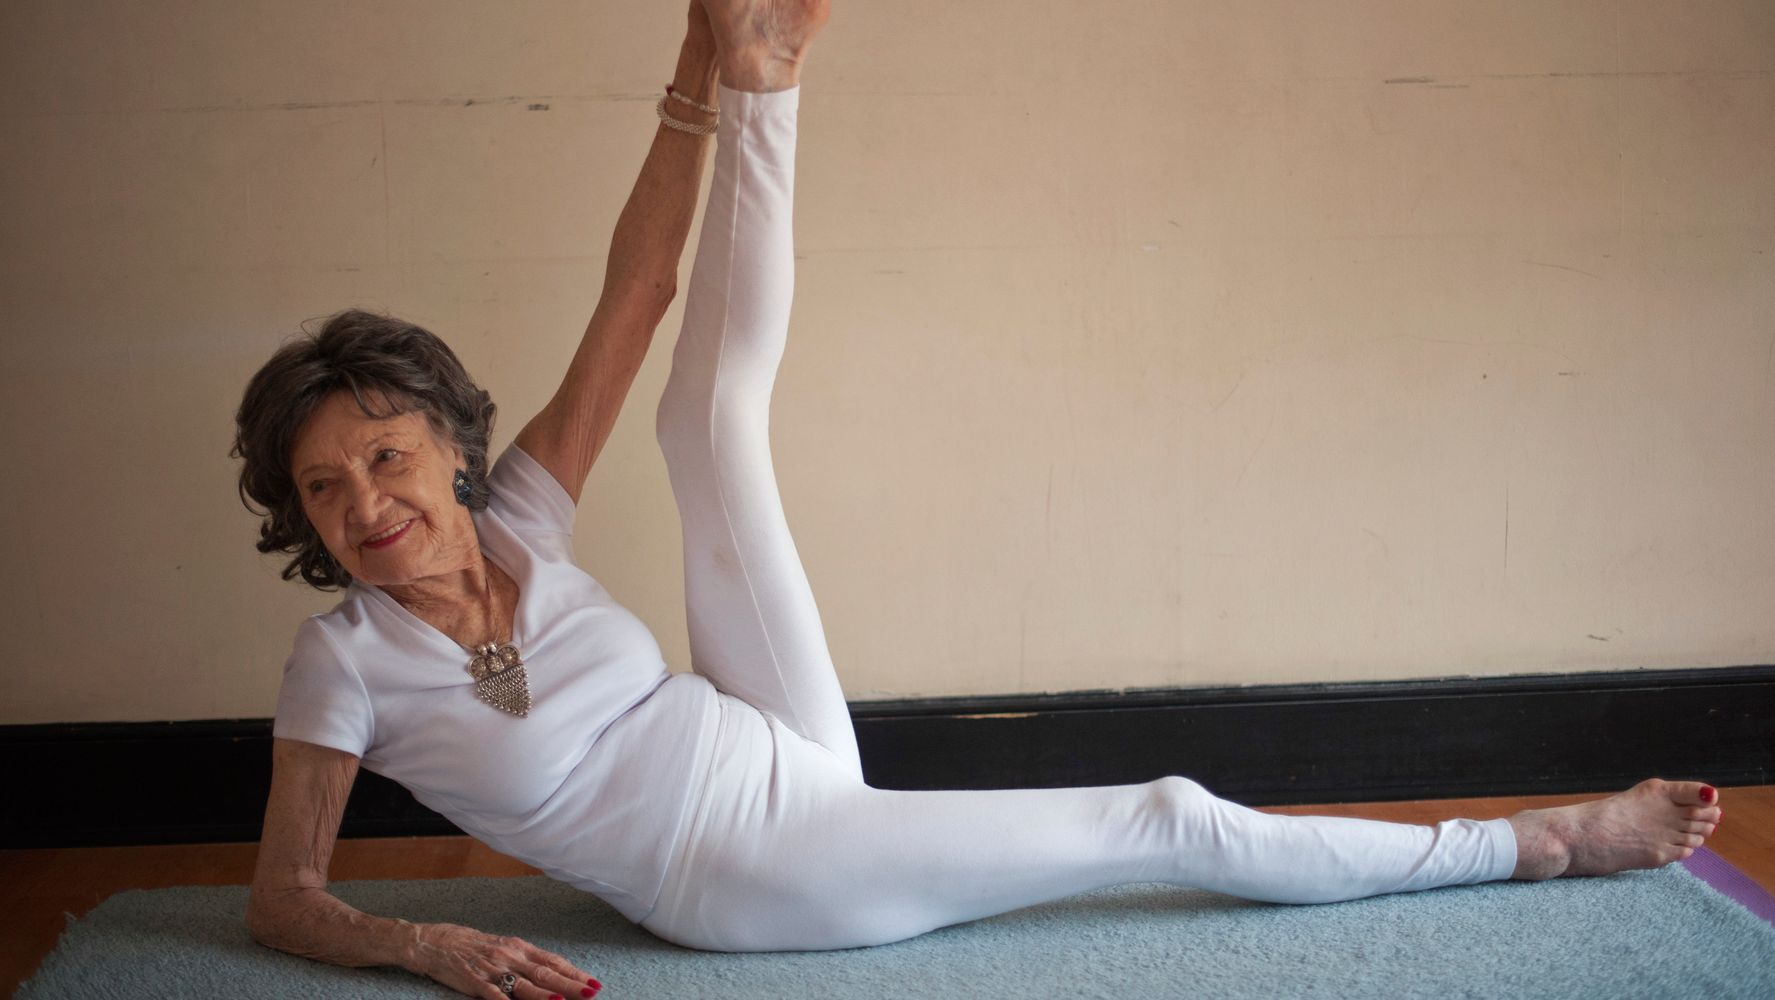 World's Oldest Yoga Teacher Shares 3 Secrets For Lifelong Happiness